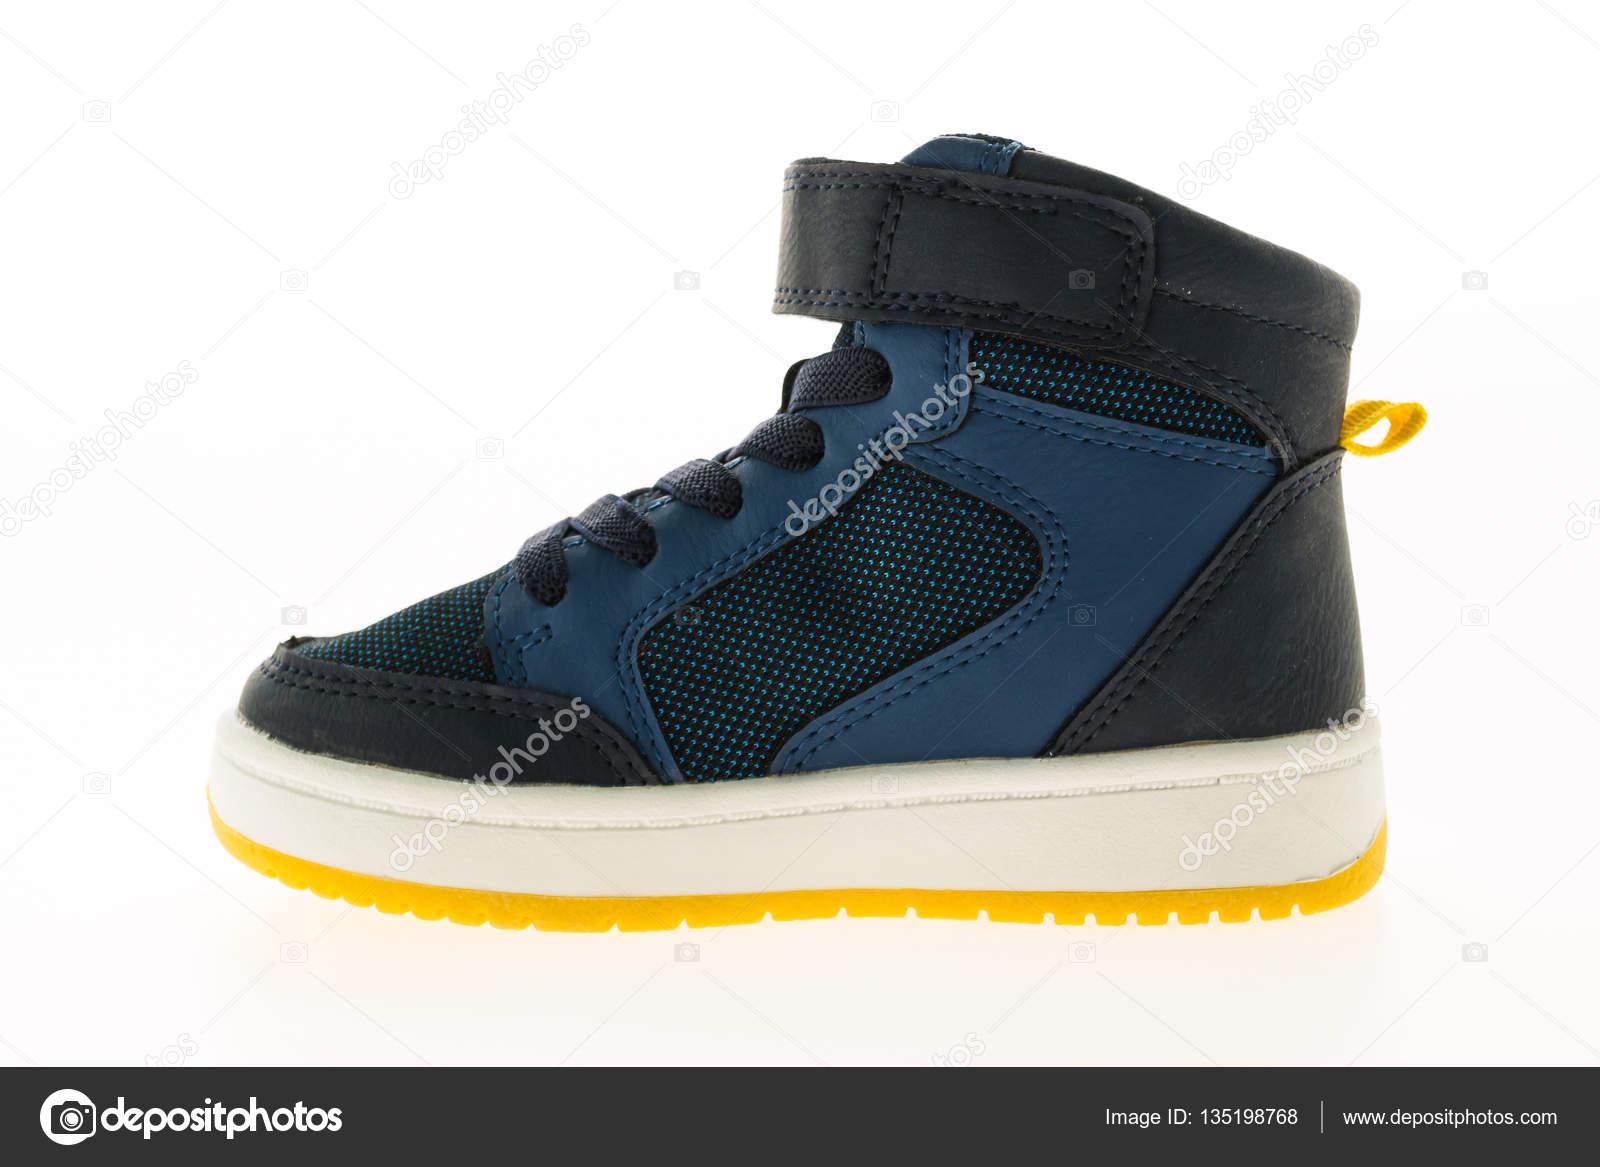 fe62d6dbcb4 Μόδα παπούτσια και αθλητικά — Φωτογραφία Αρχείου © mrsiraphol #135198768